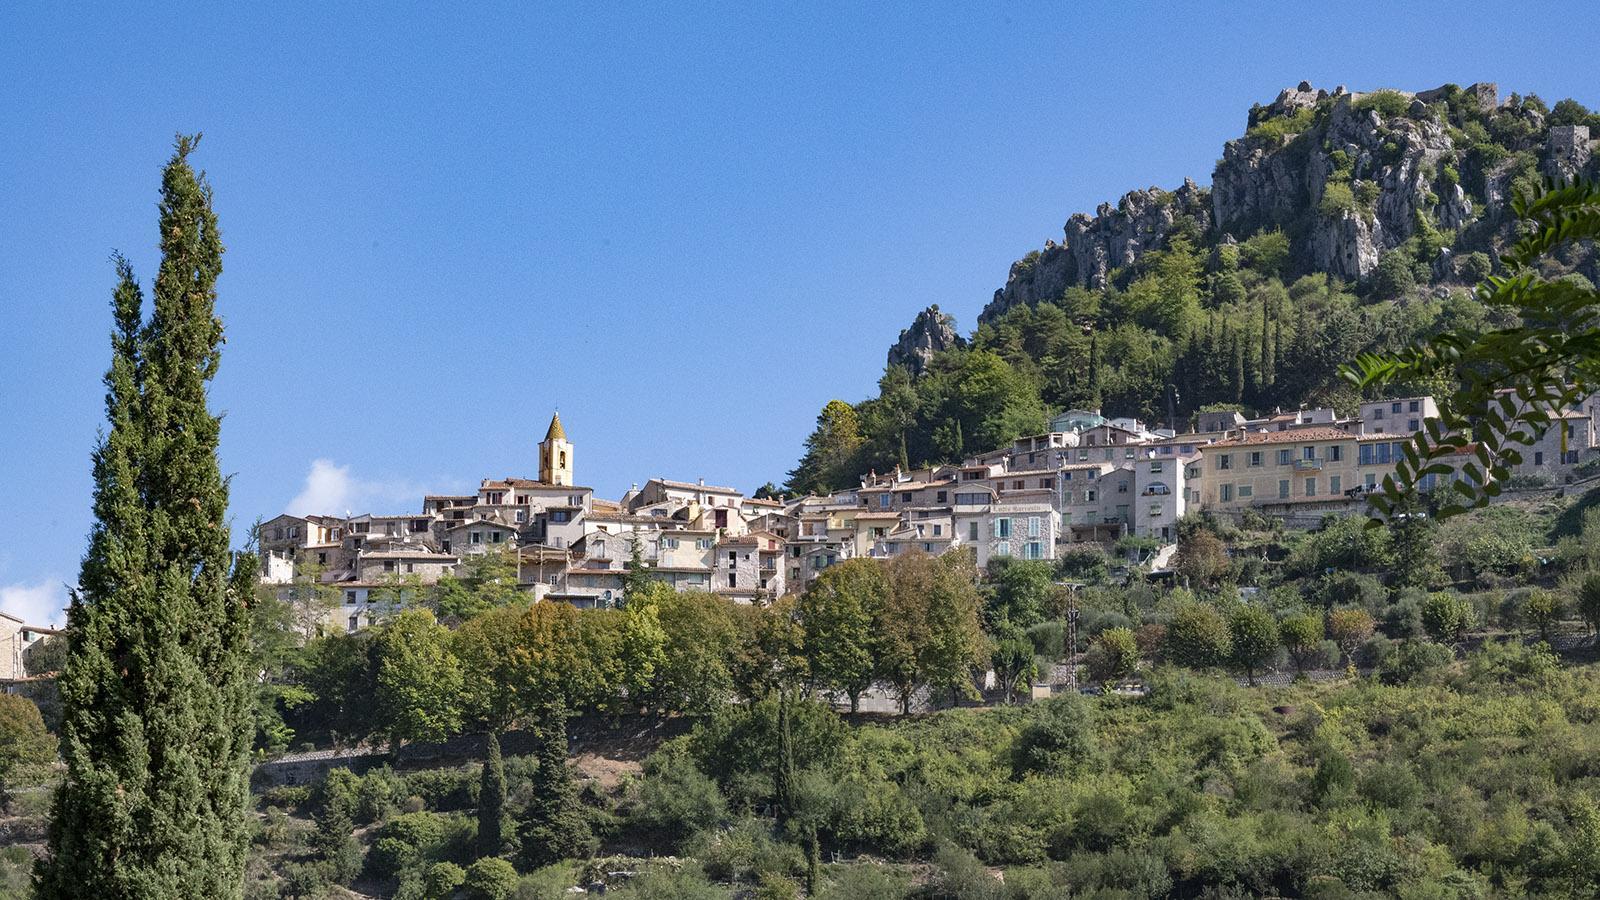 Saint-Agnès, ein <em>village perché</em> im Hinterland von Menton.